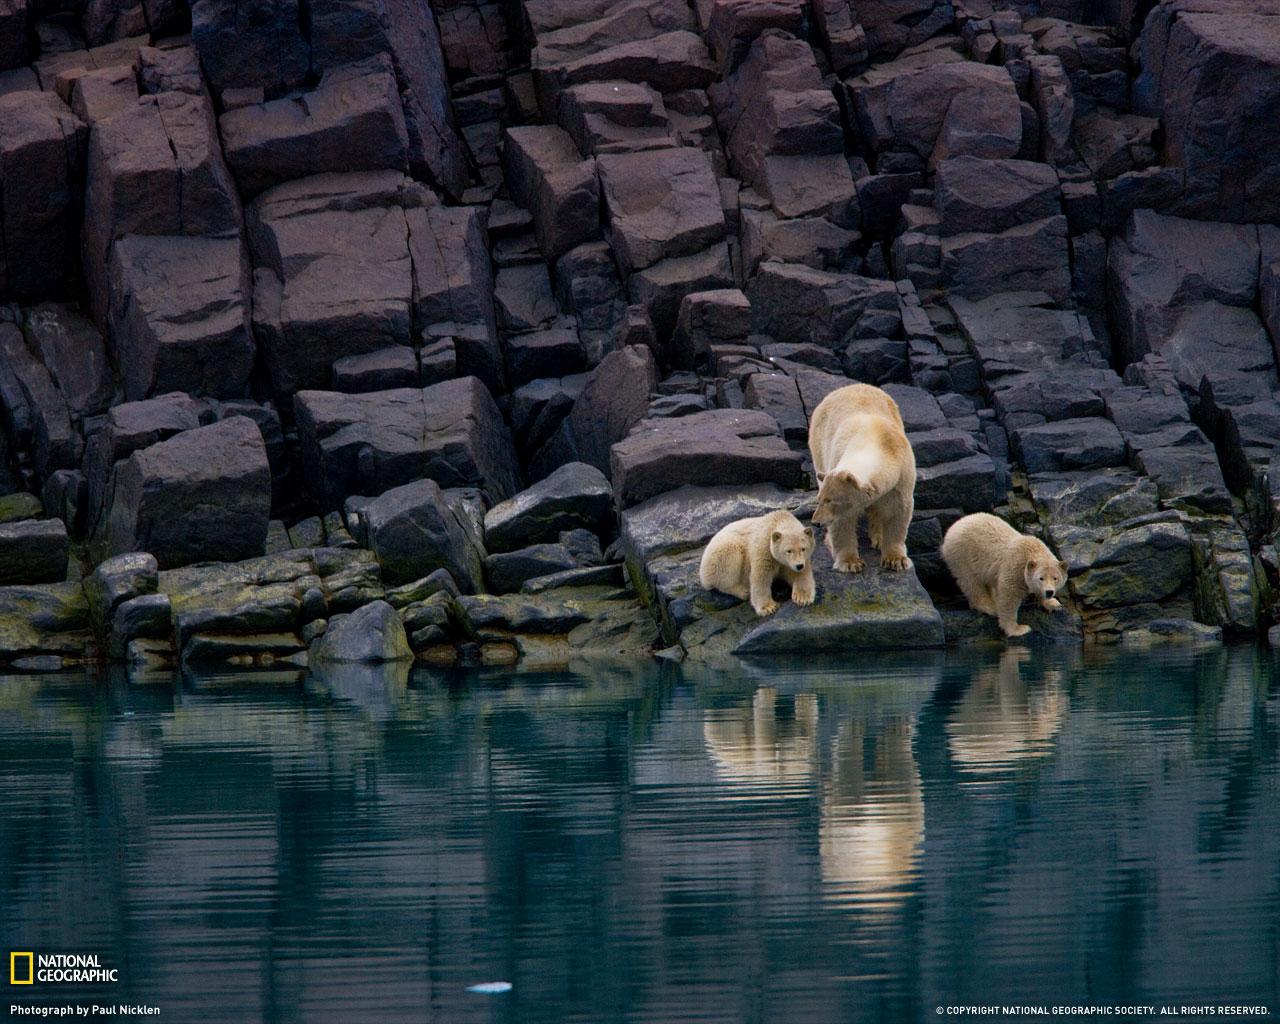 16) Белая медведица с медвежатами.